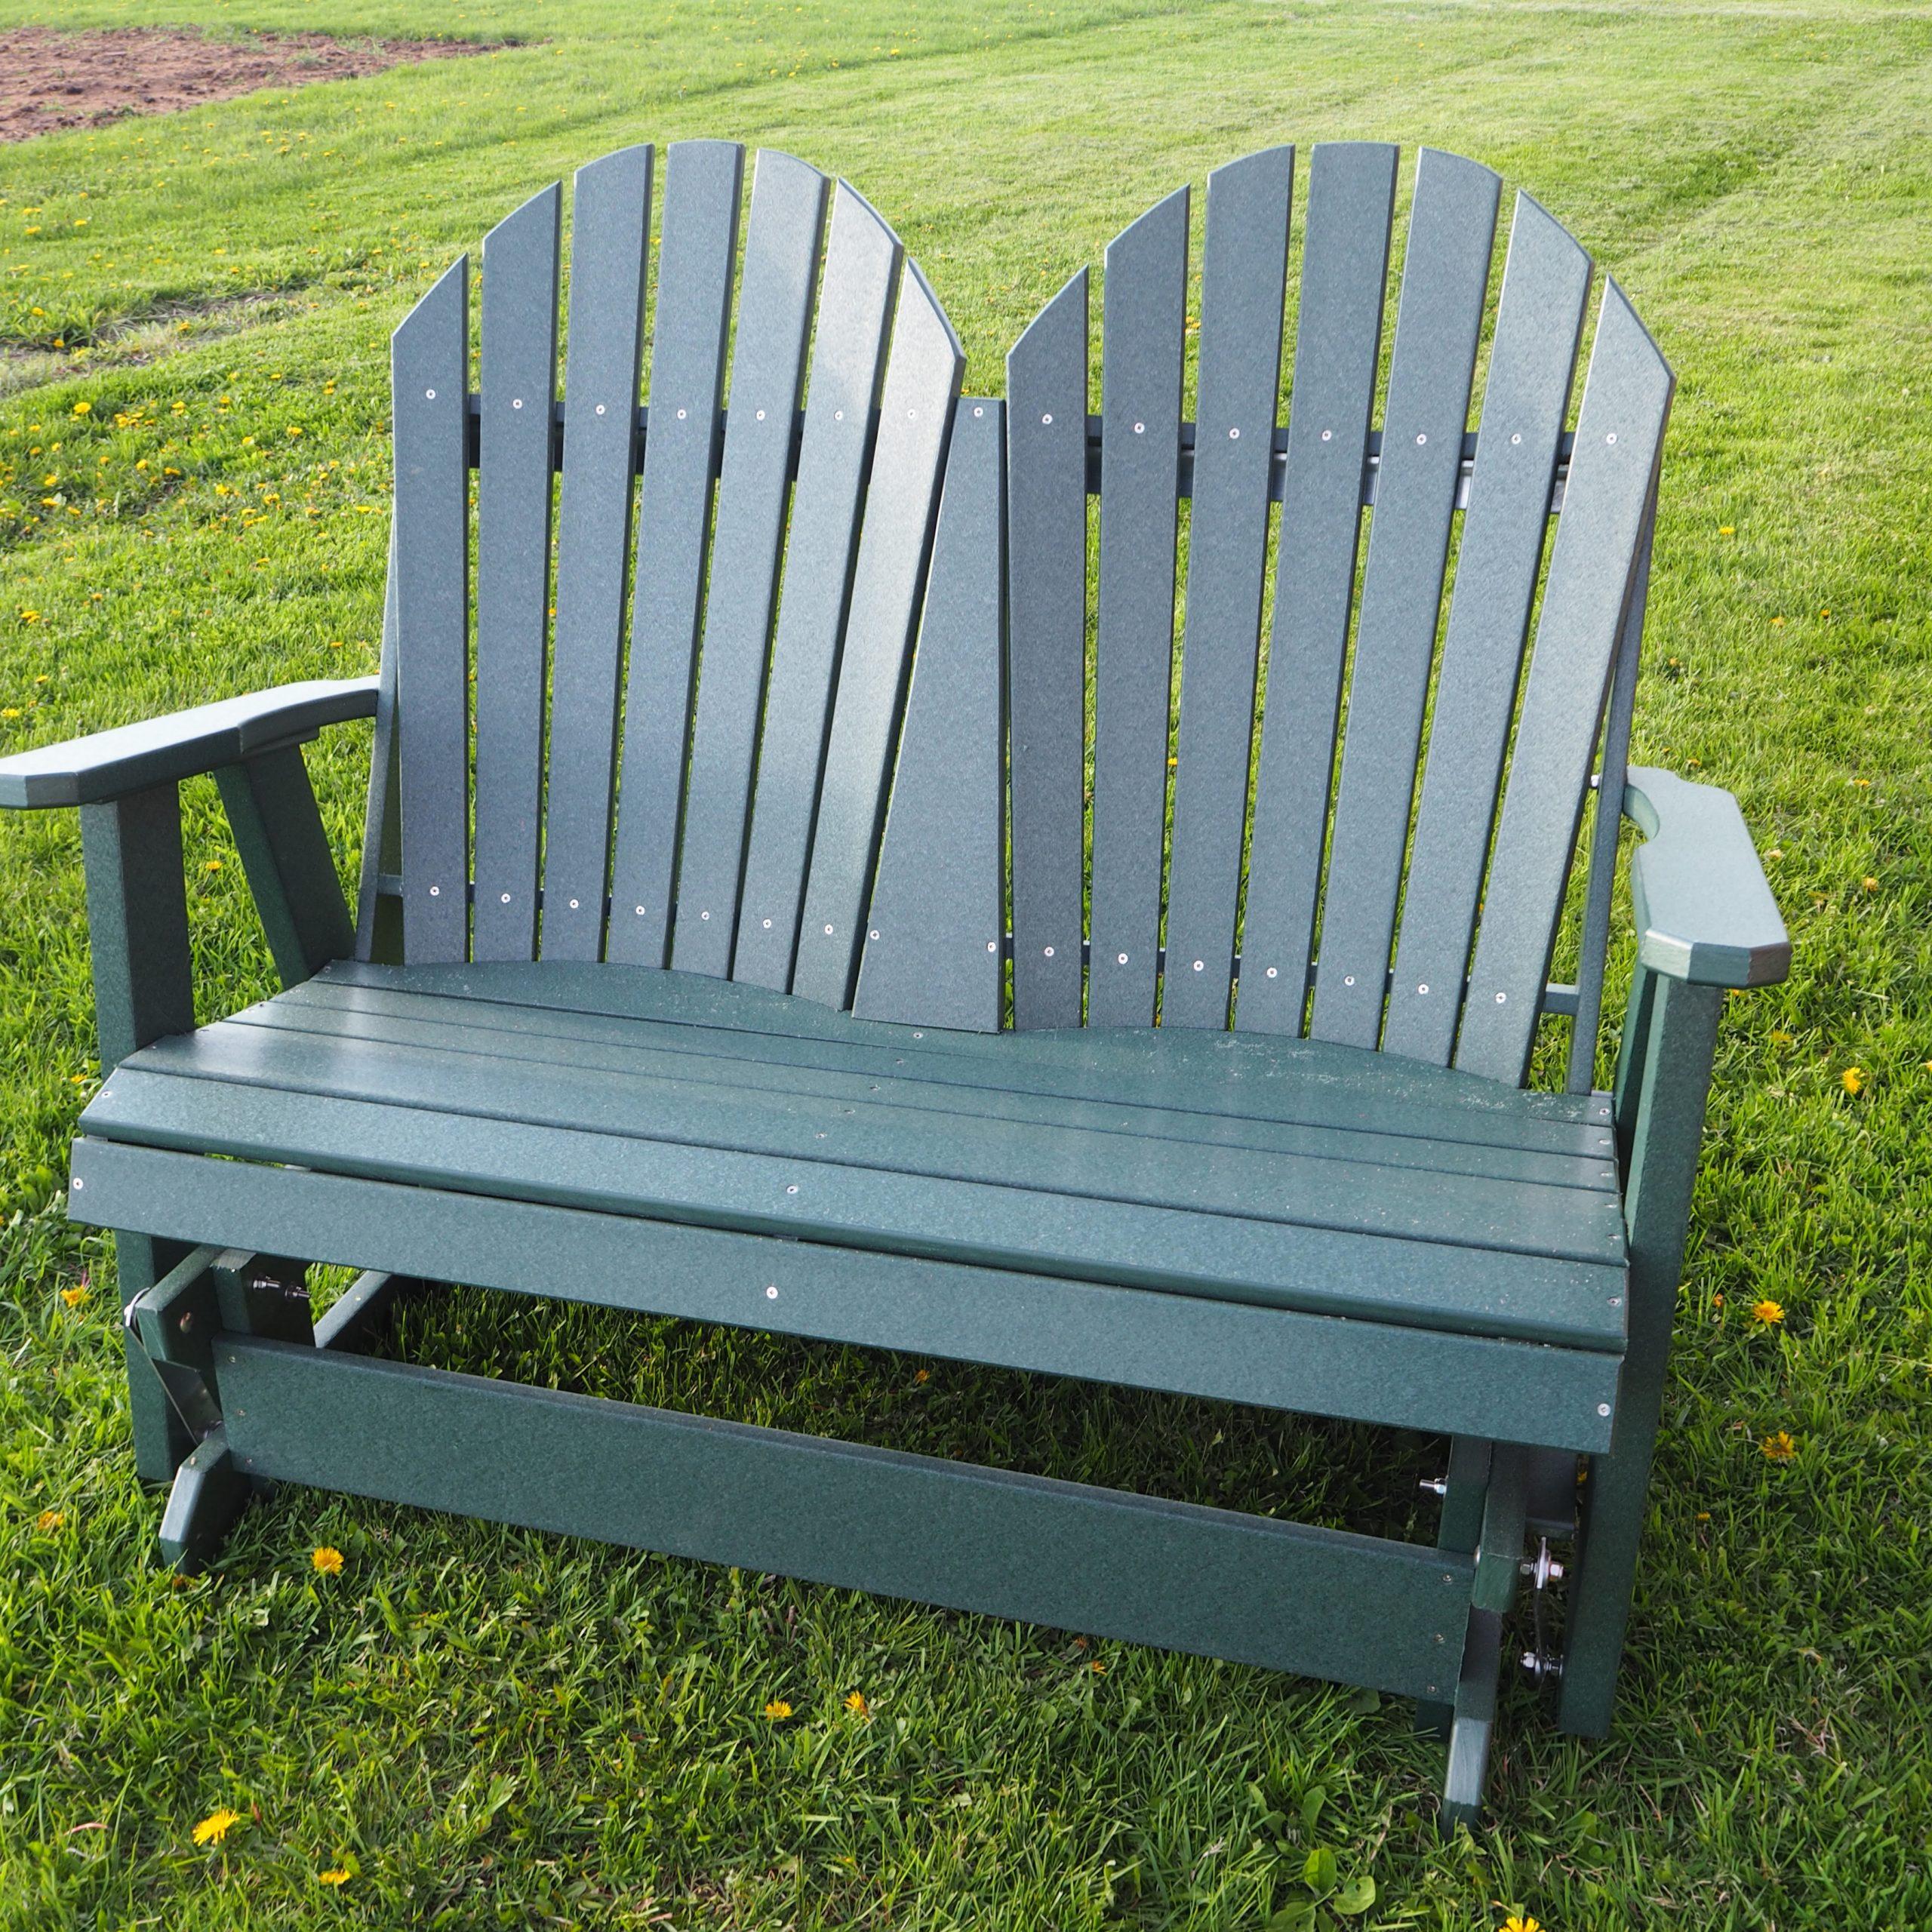 Famous Green Leaf's 4′ Fan Back Glider – Green Leaf Furniture Regarding Fanback Glider Benches (Gallery 28 of 30)